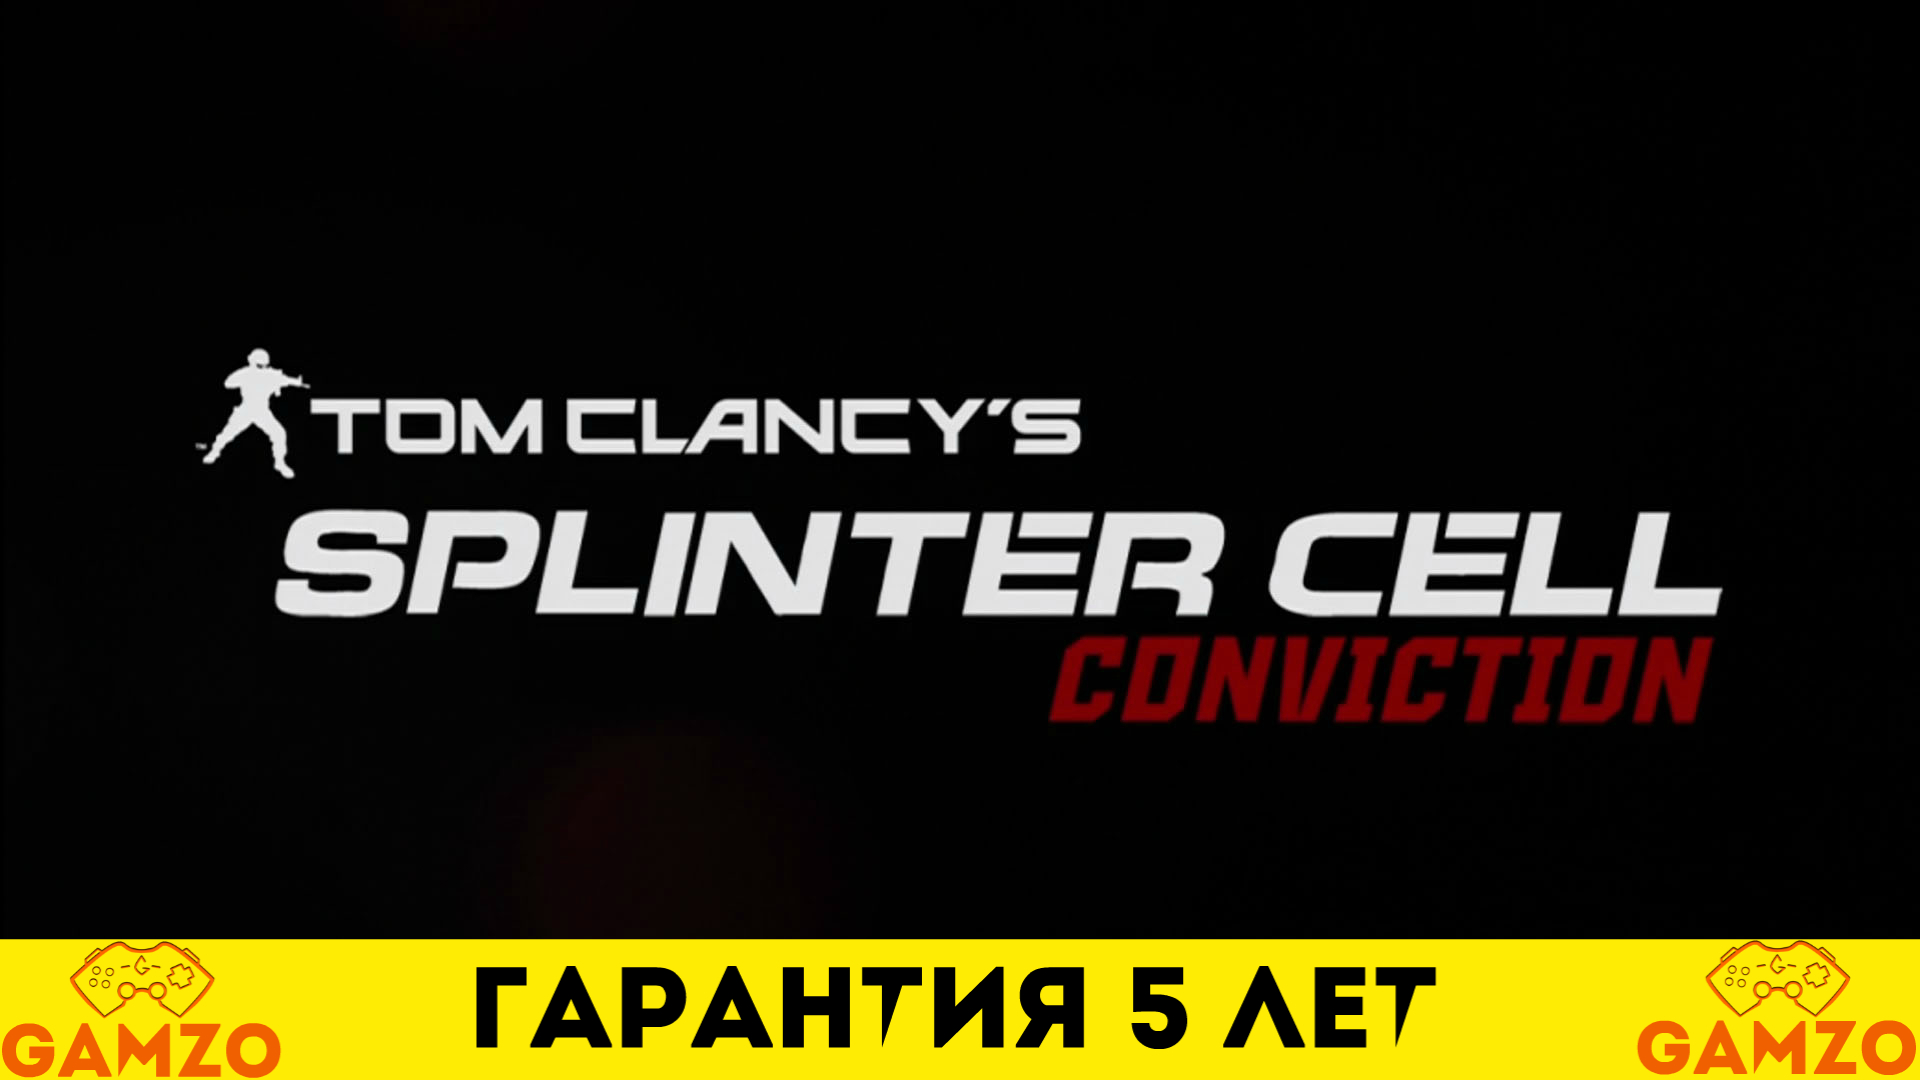 Splinter Cell Conviction [Гарантия 5 лет] + Подарок